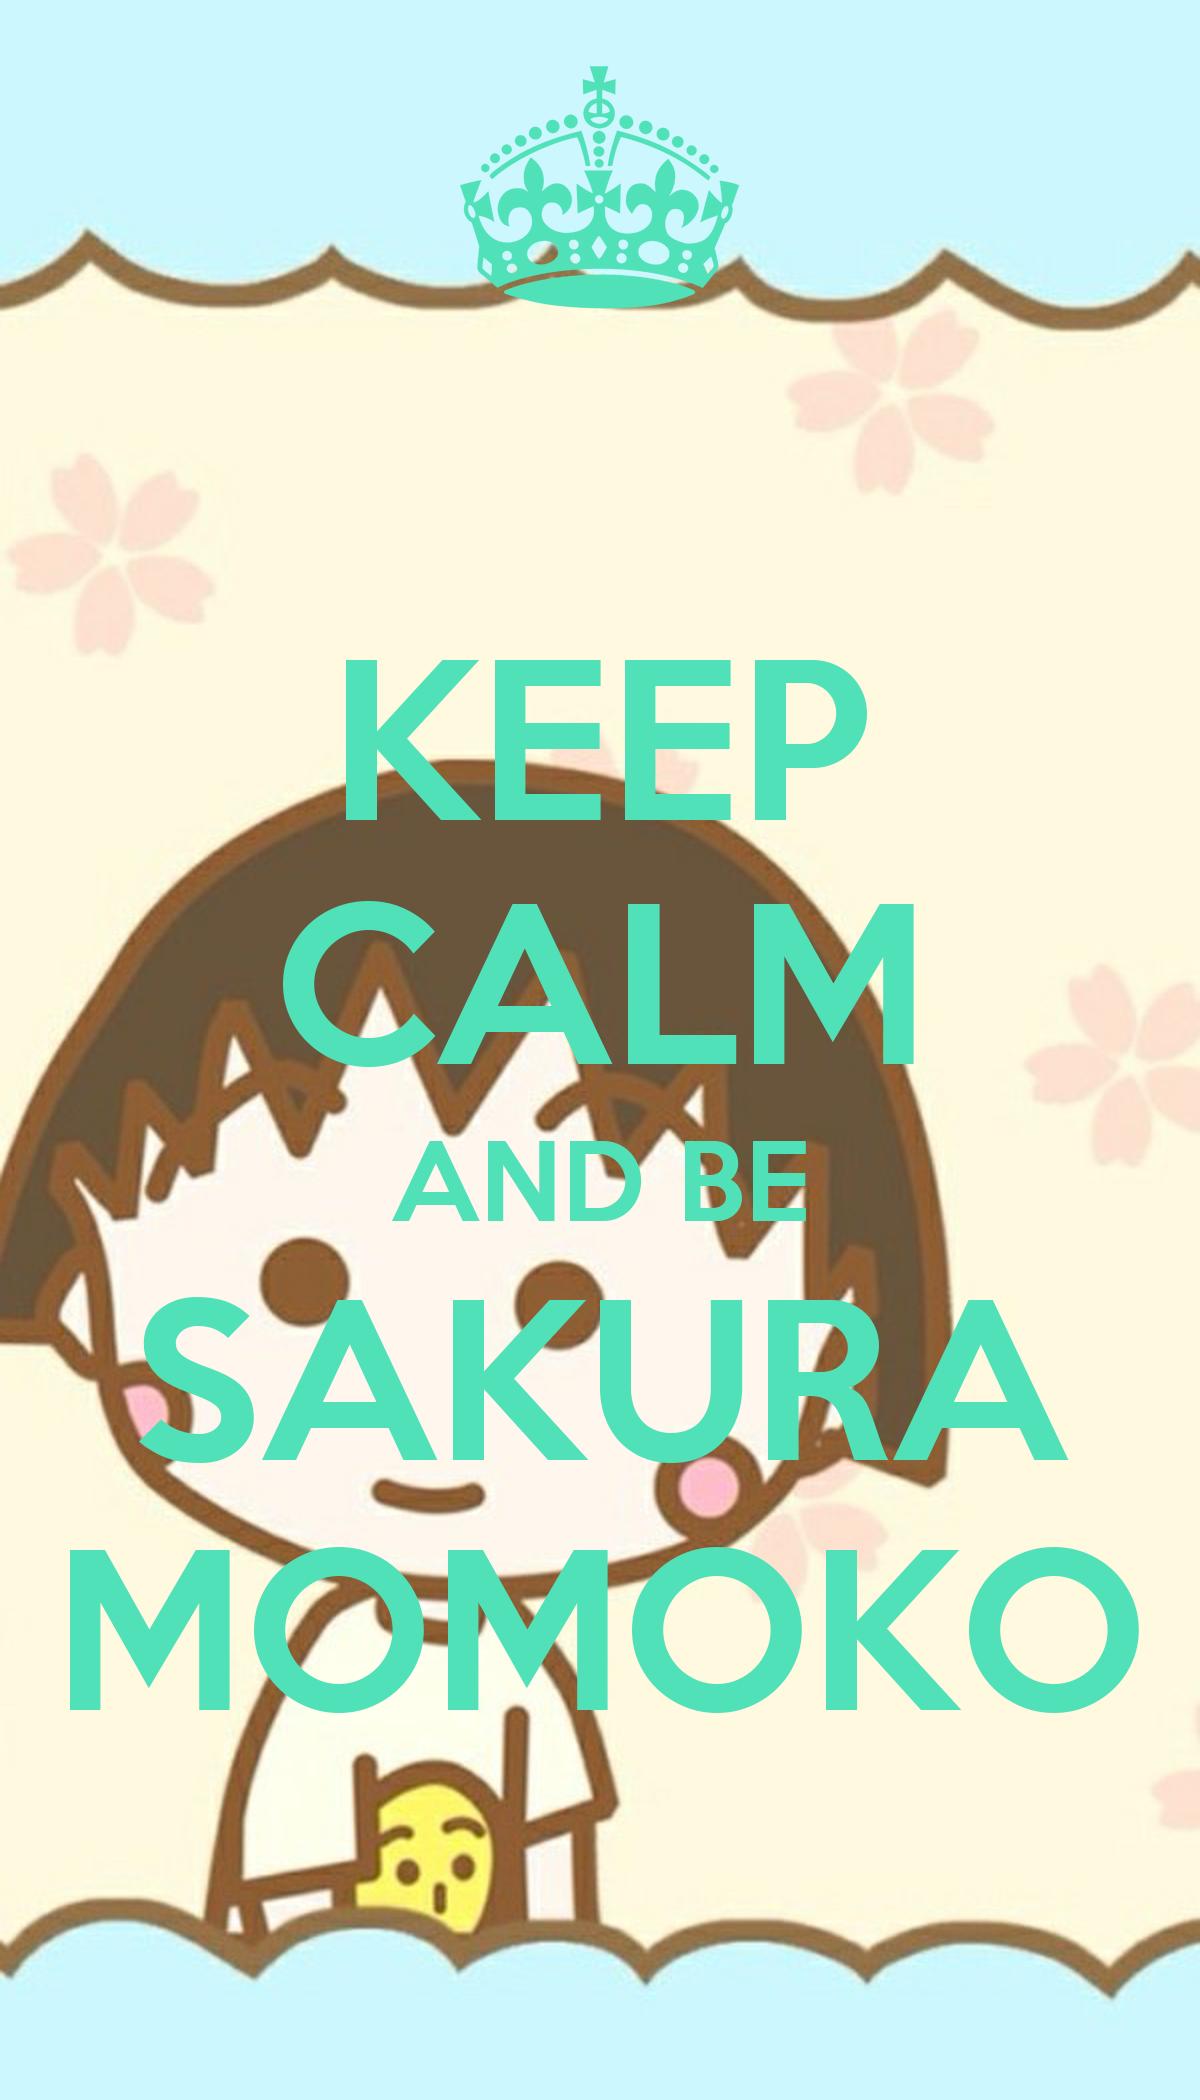 Manga artist Momoko Sakura was also a champion of Japanese music